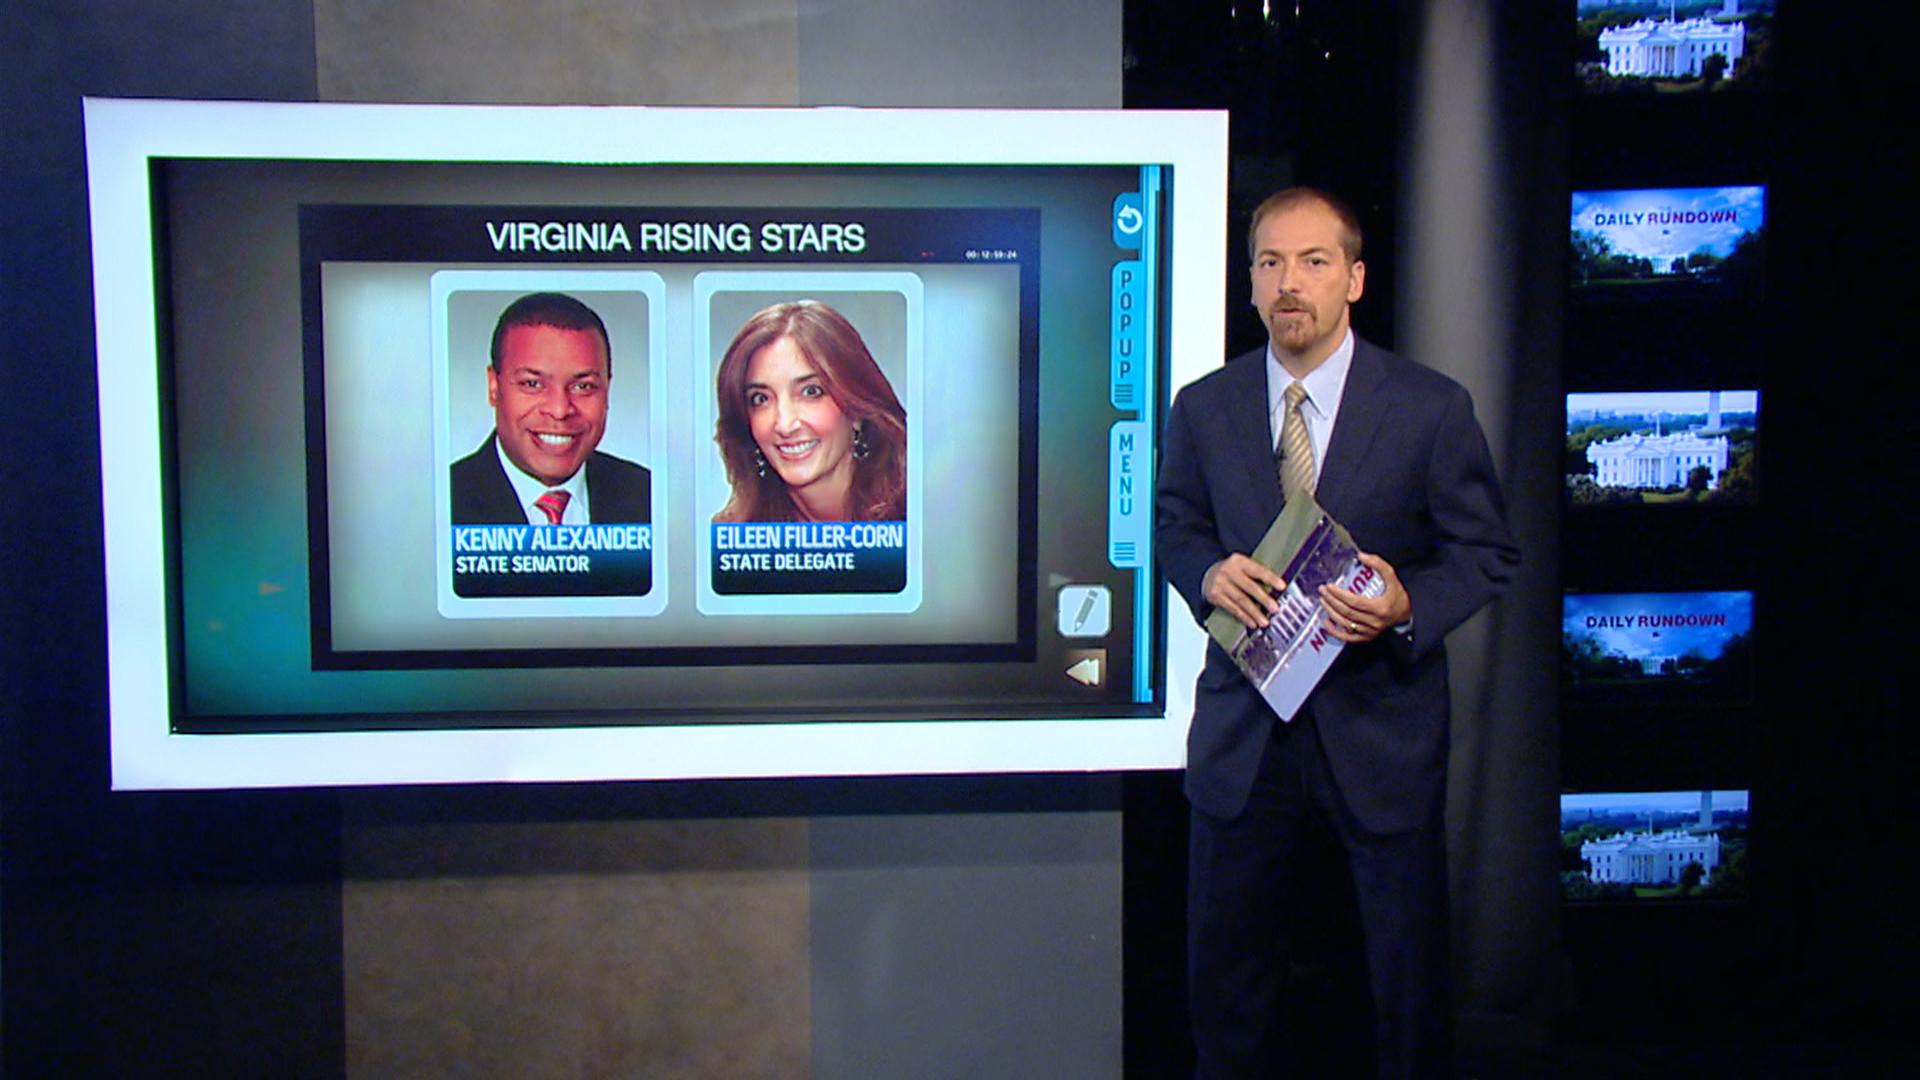 Meet the rising stars in Virginia